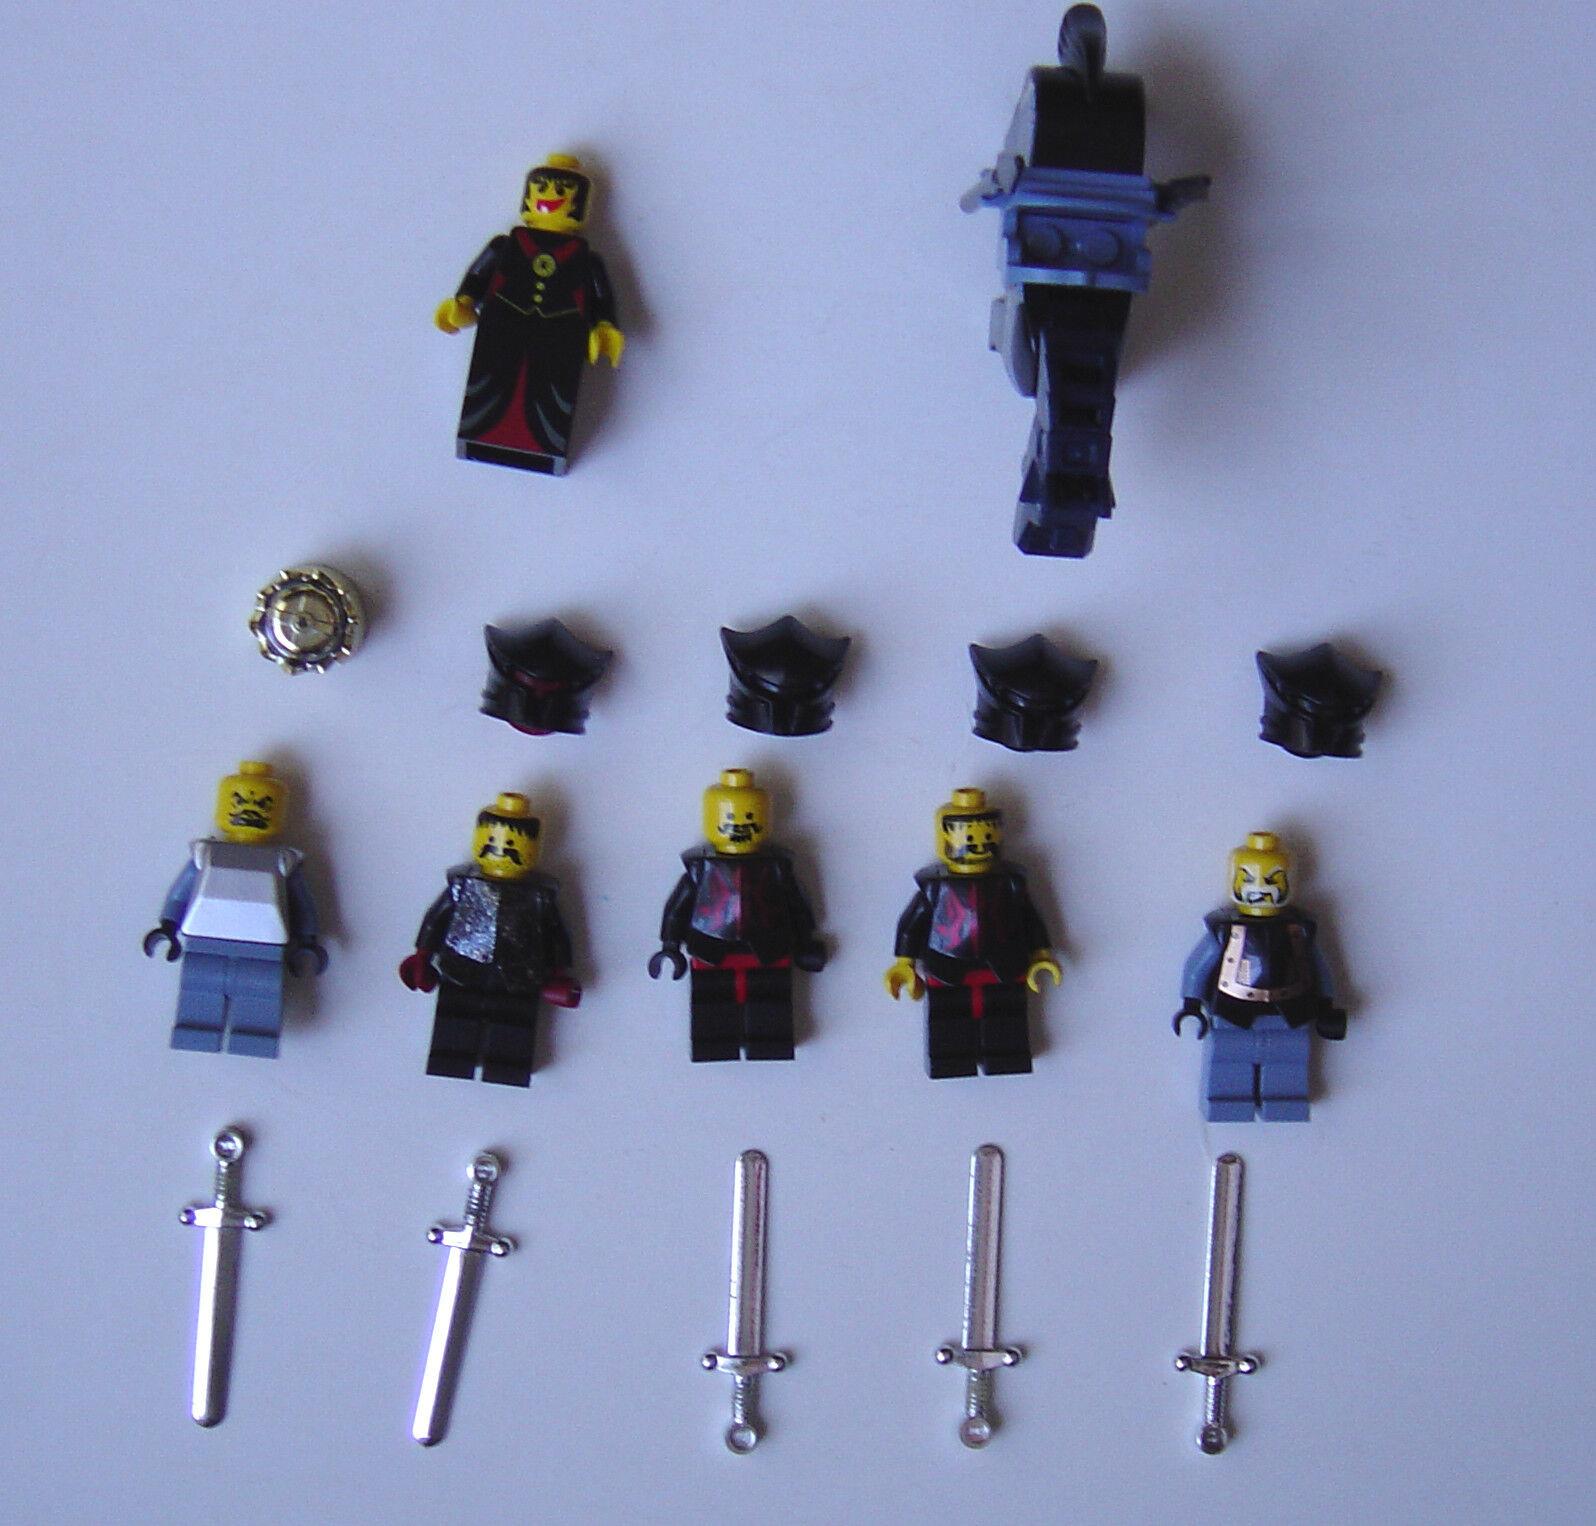 6 LEGO CASTLE EVIL QUEEN MINIFIGURES SILVER SWORDS HORSE HELMETS FANTASY ERA - $32.99